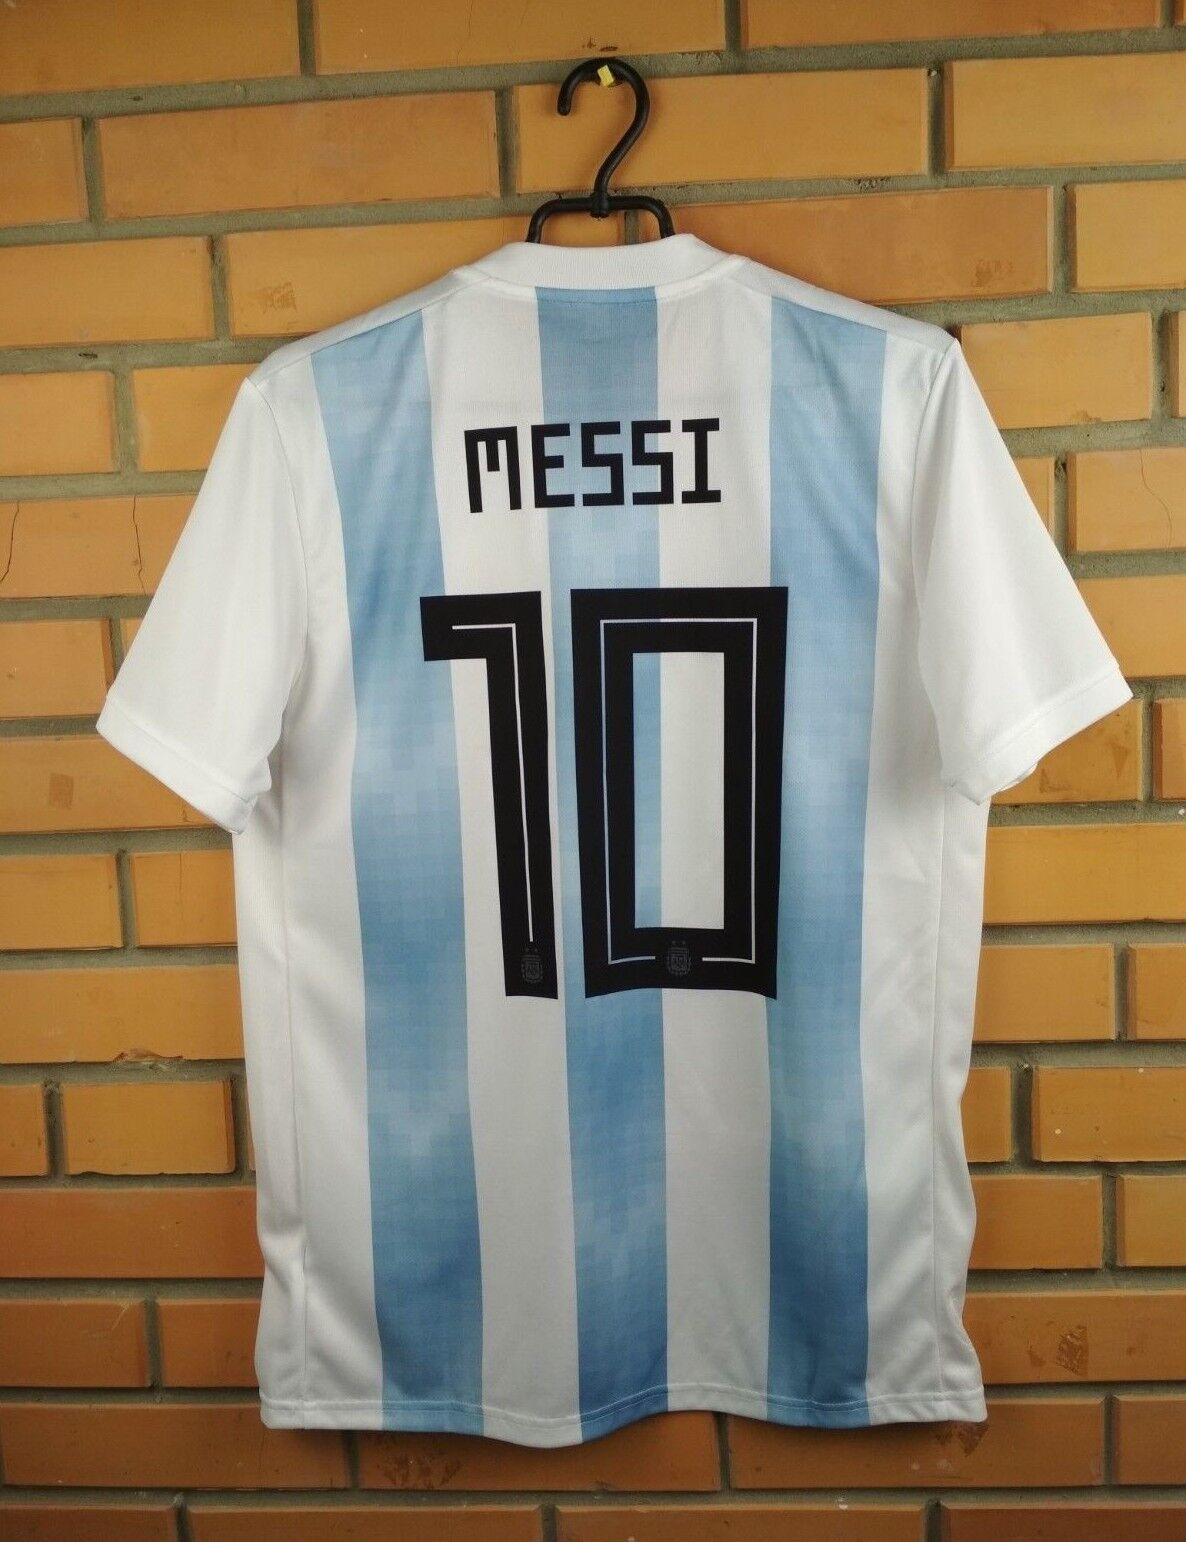 1010 Messi argentoina jersey XL 2018 home shirt BQ9324 soccer footbtutti Adidas